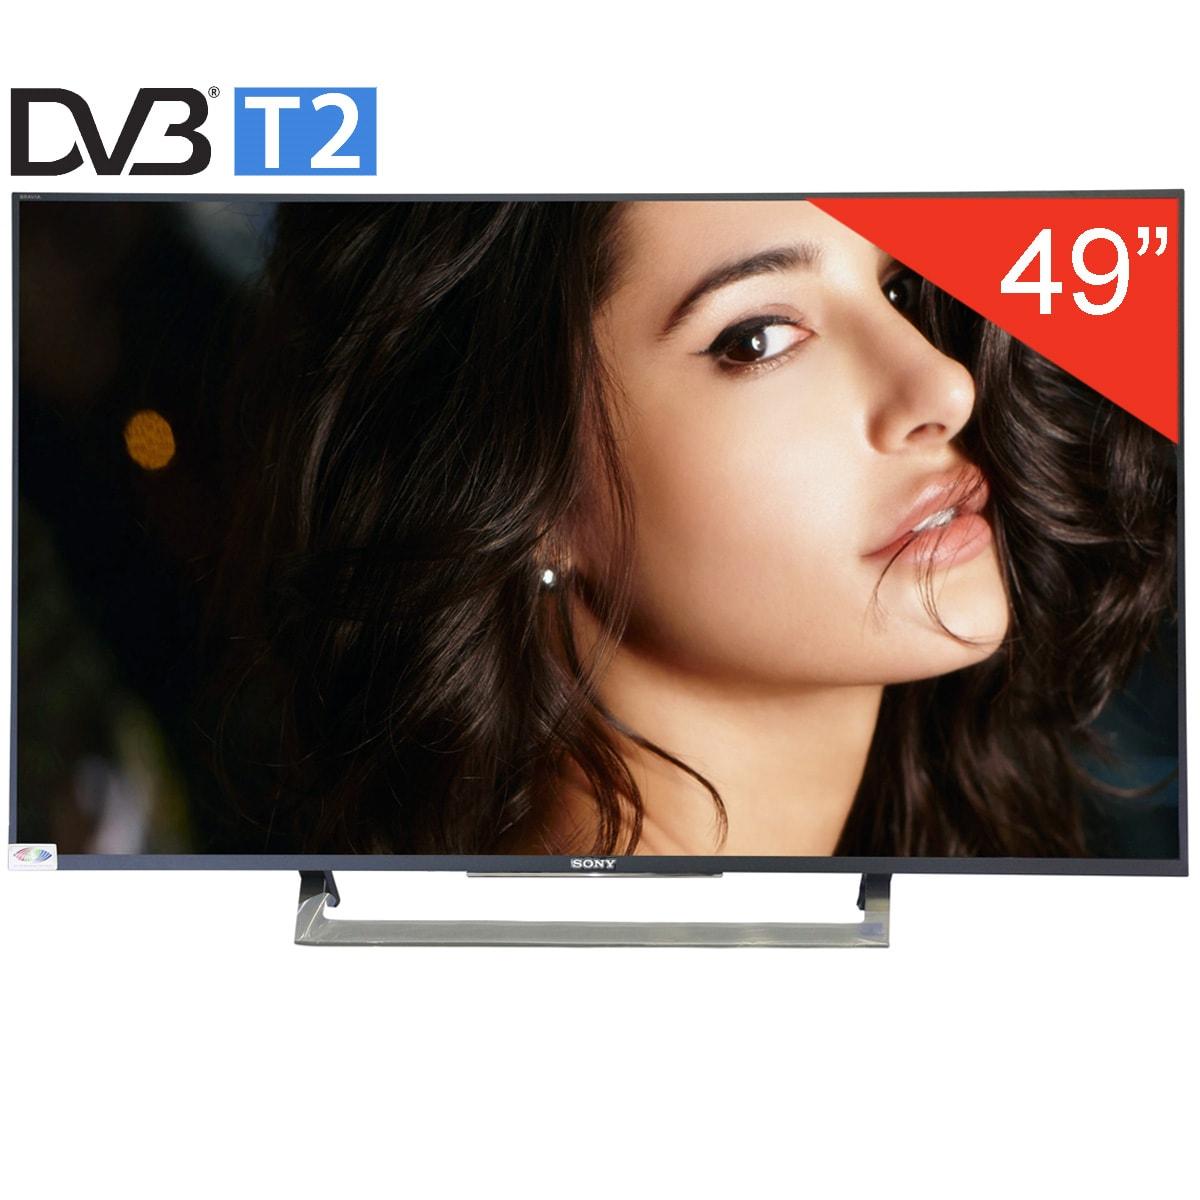 Đánh giá Tivi Led Sony KD49X8000D 49 Inch